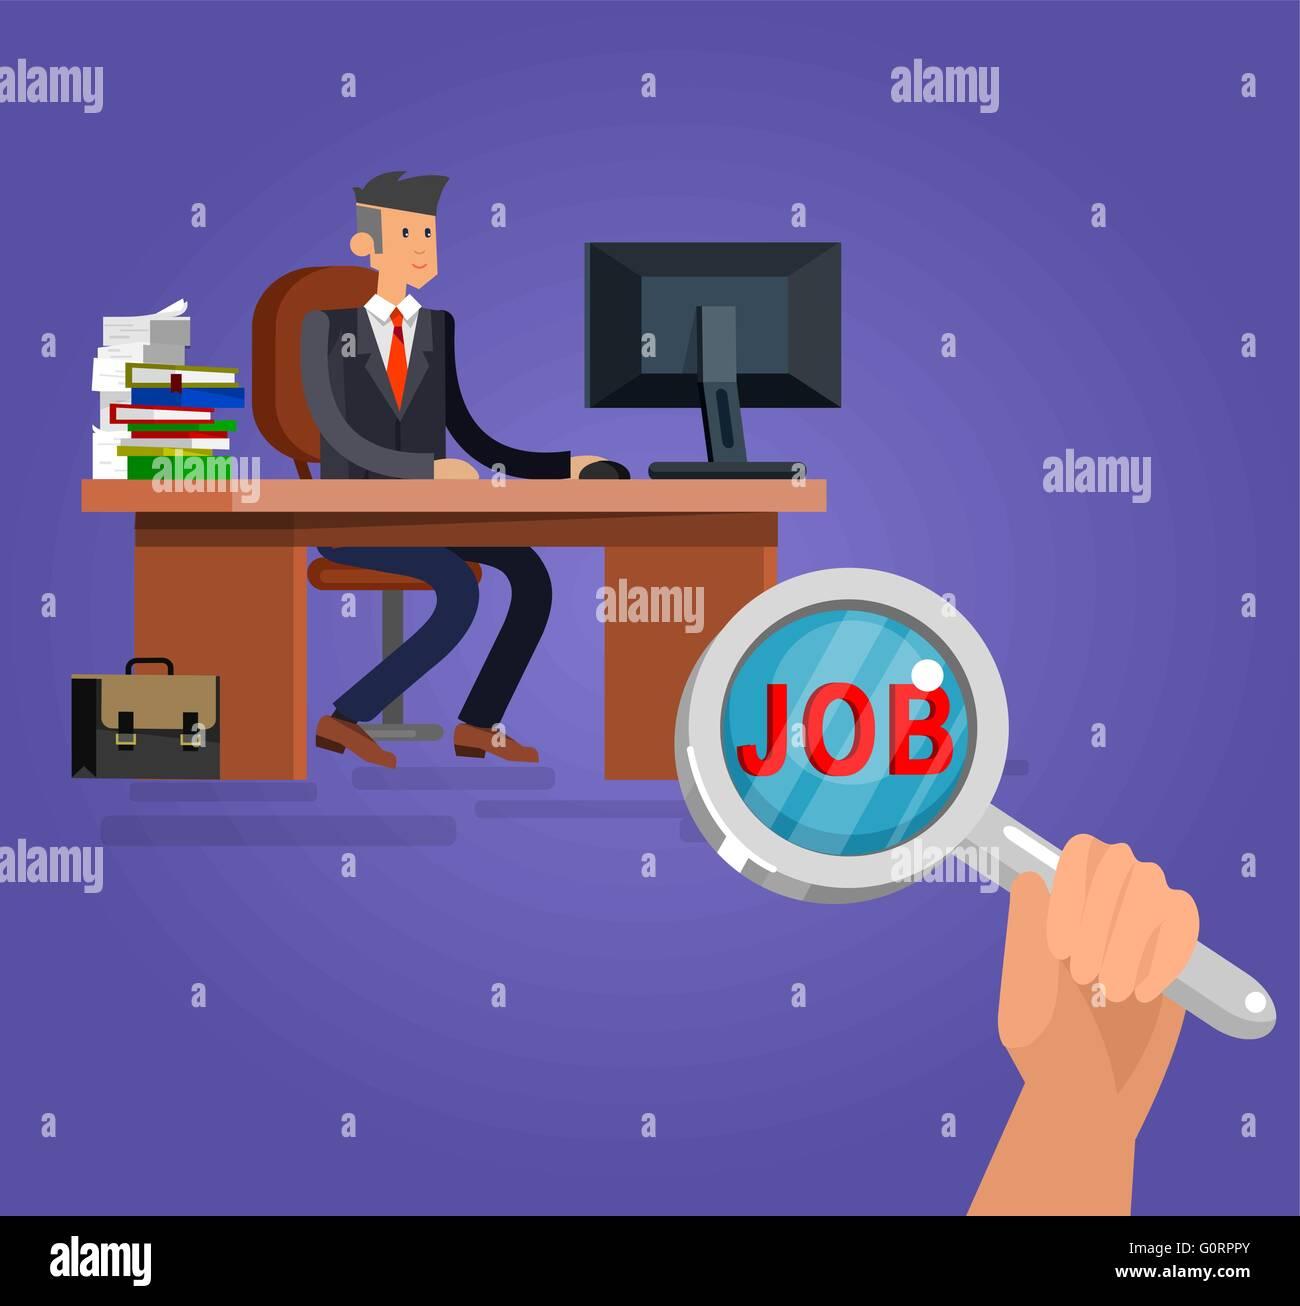 Job-Suche und Human Resources. Flache Vektor-illustration Stockbild